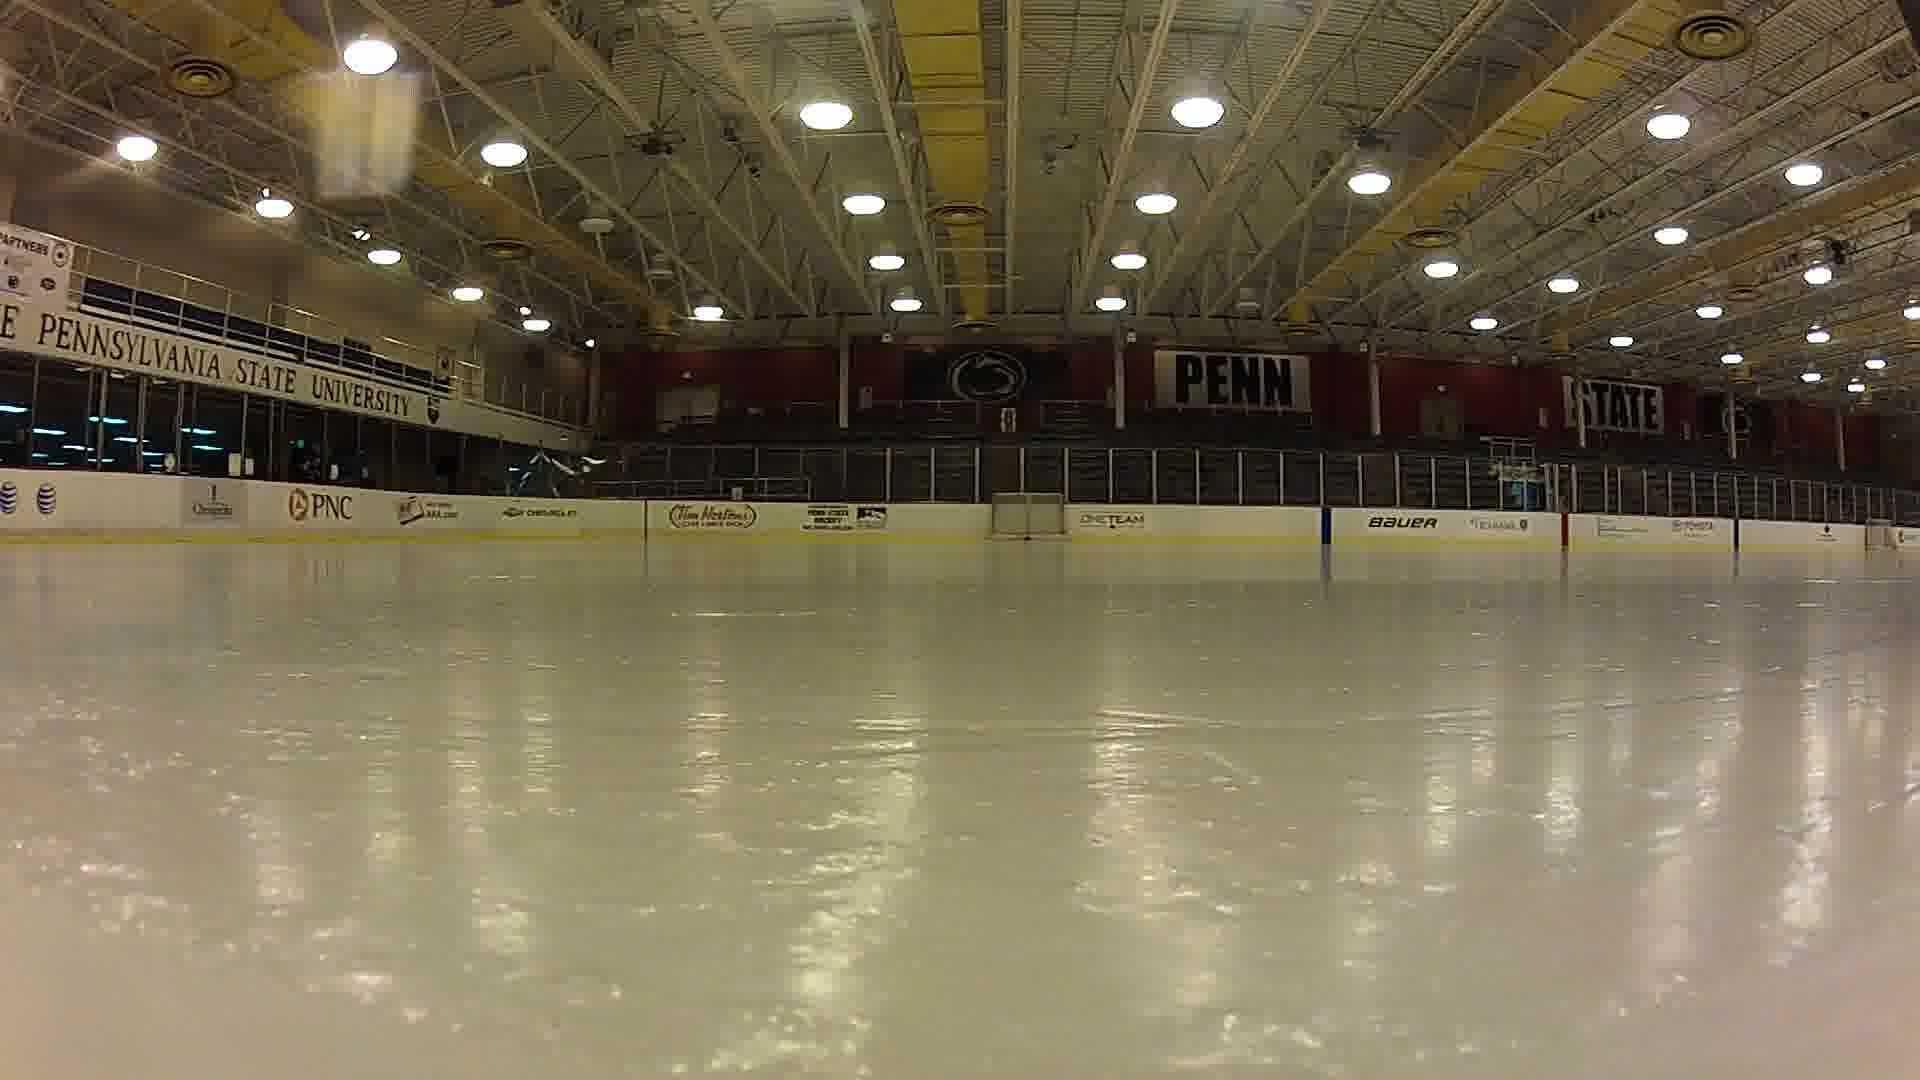 Penn State hockey rink